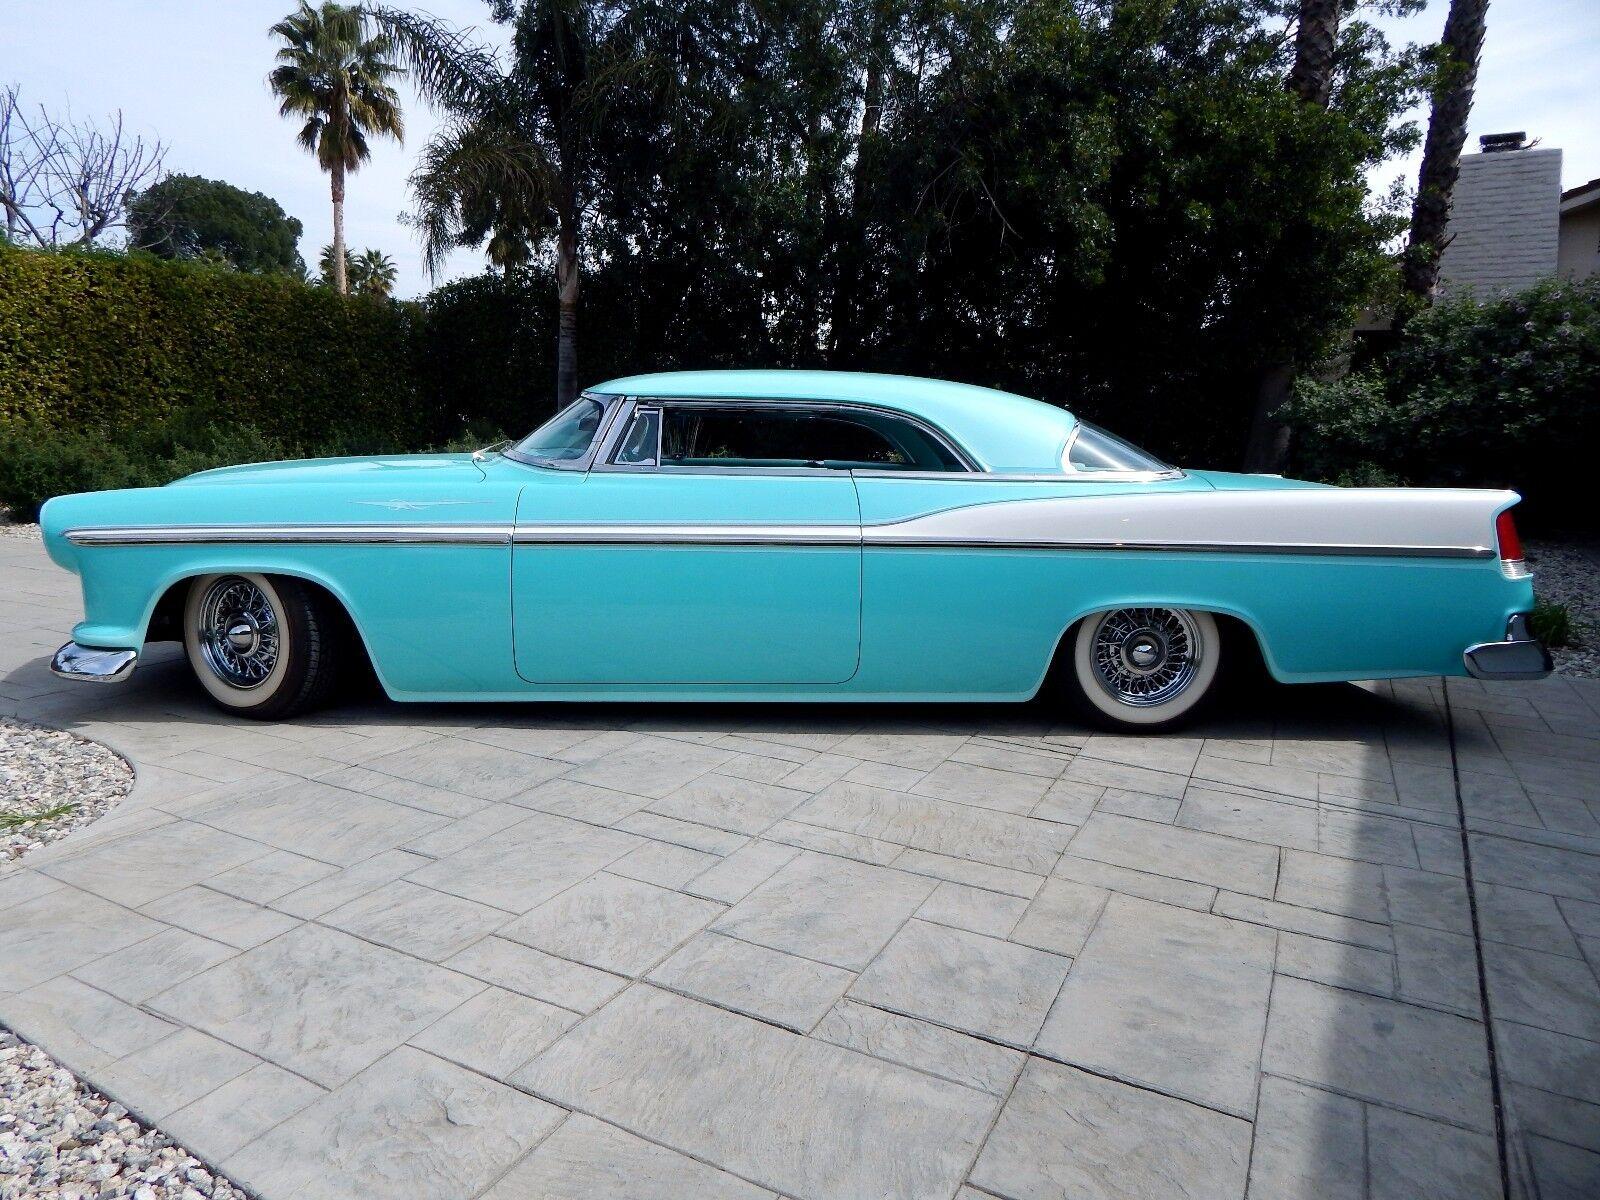 1956 Chrysler Windsor Custom by Richard Zocchi - Art Himsl - Jerry Sahagon 1956 Chrysler Windsor Show Car by Richard Zocchi - Art Himsl - Jerry - Sahagon